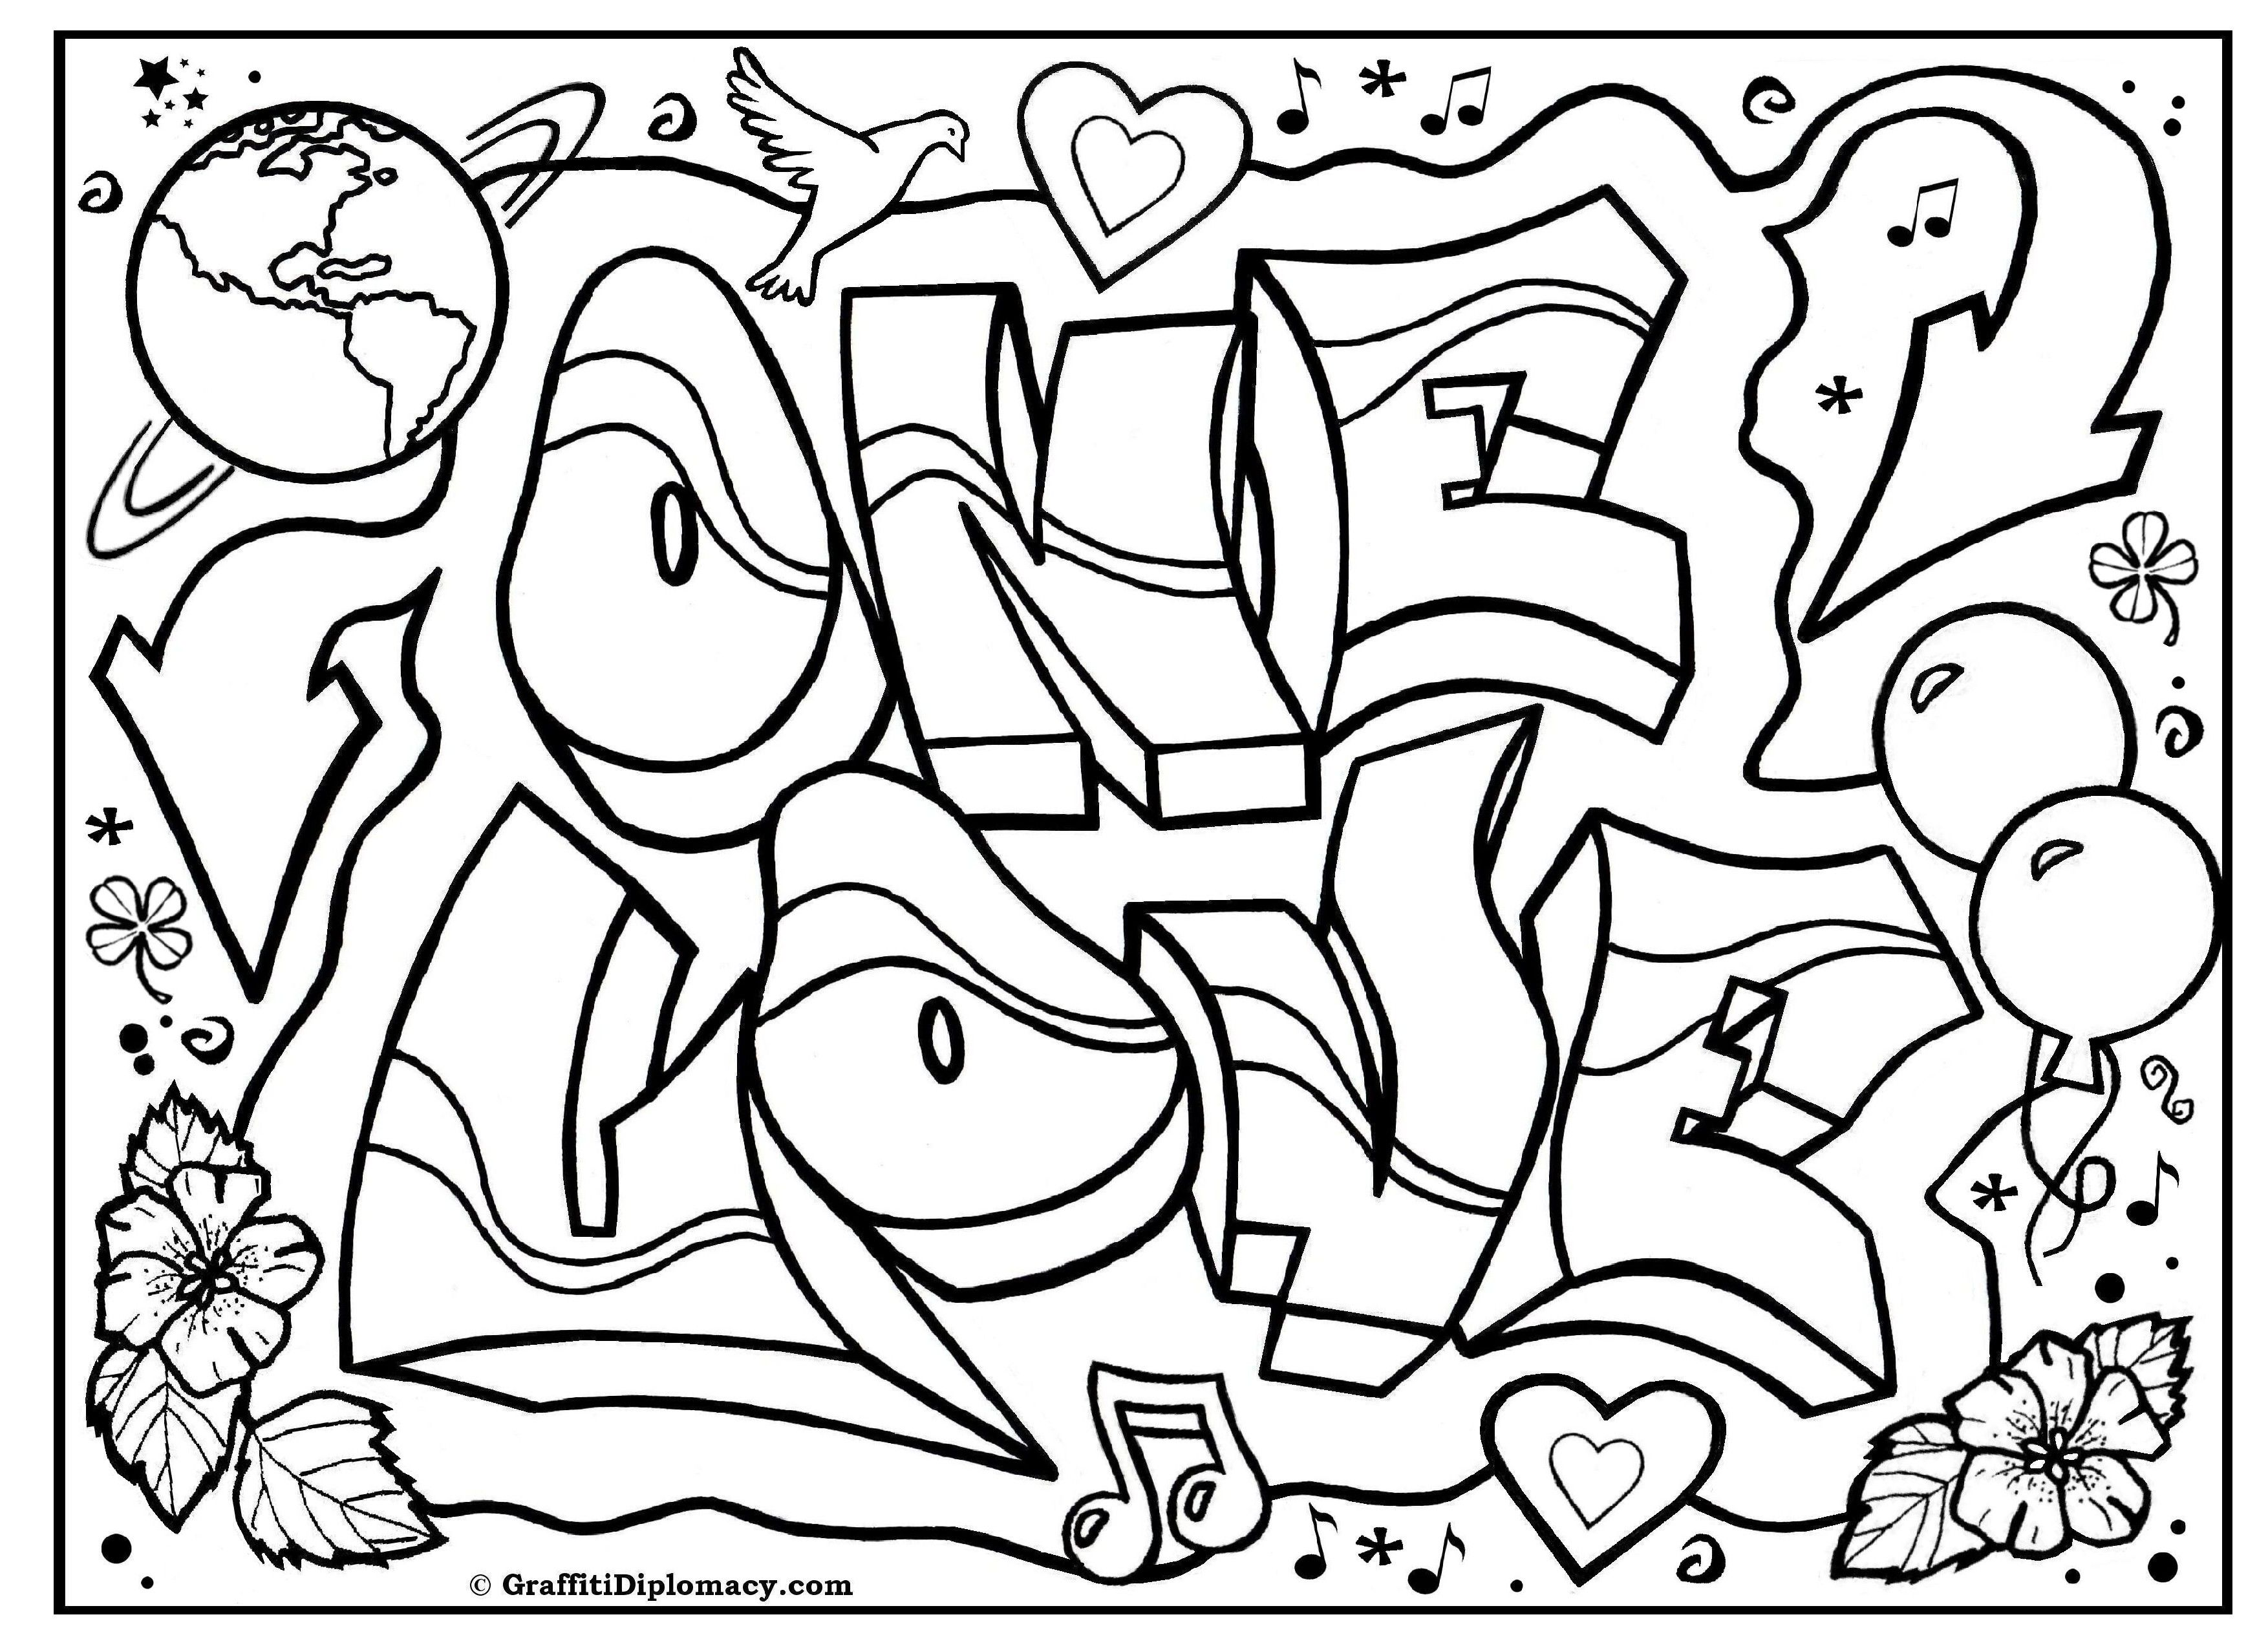 Pin On Stress Illustration Drawings